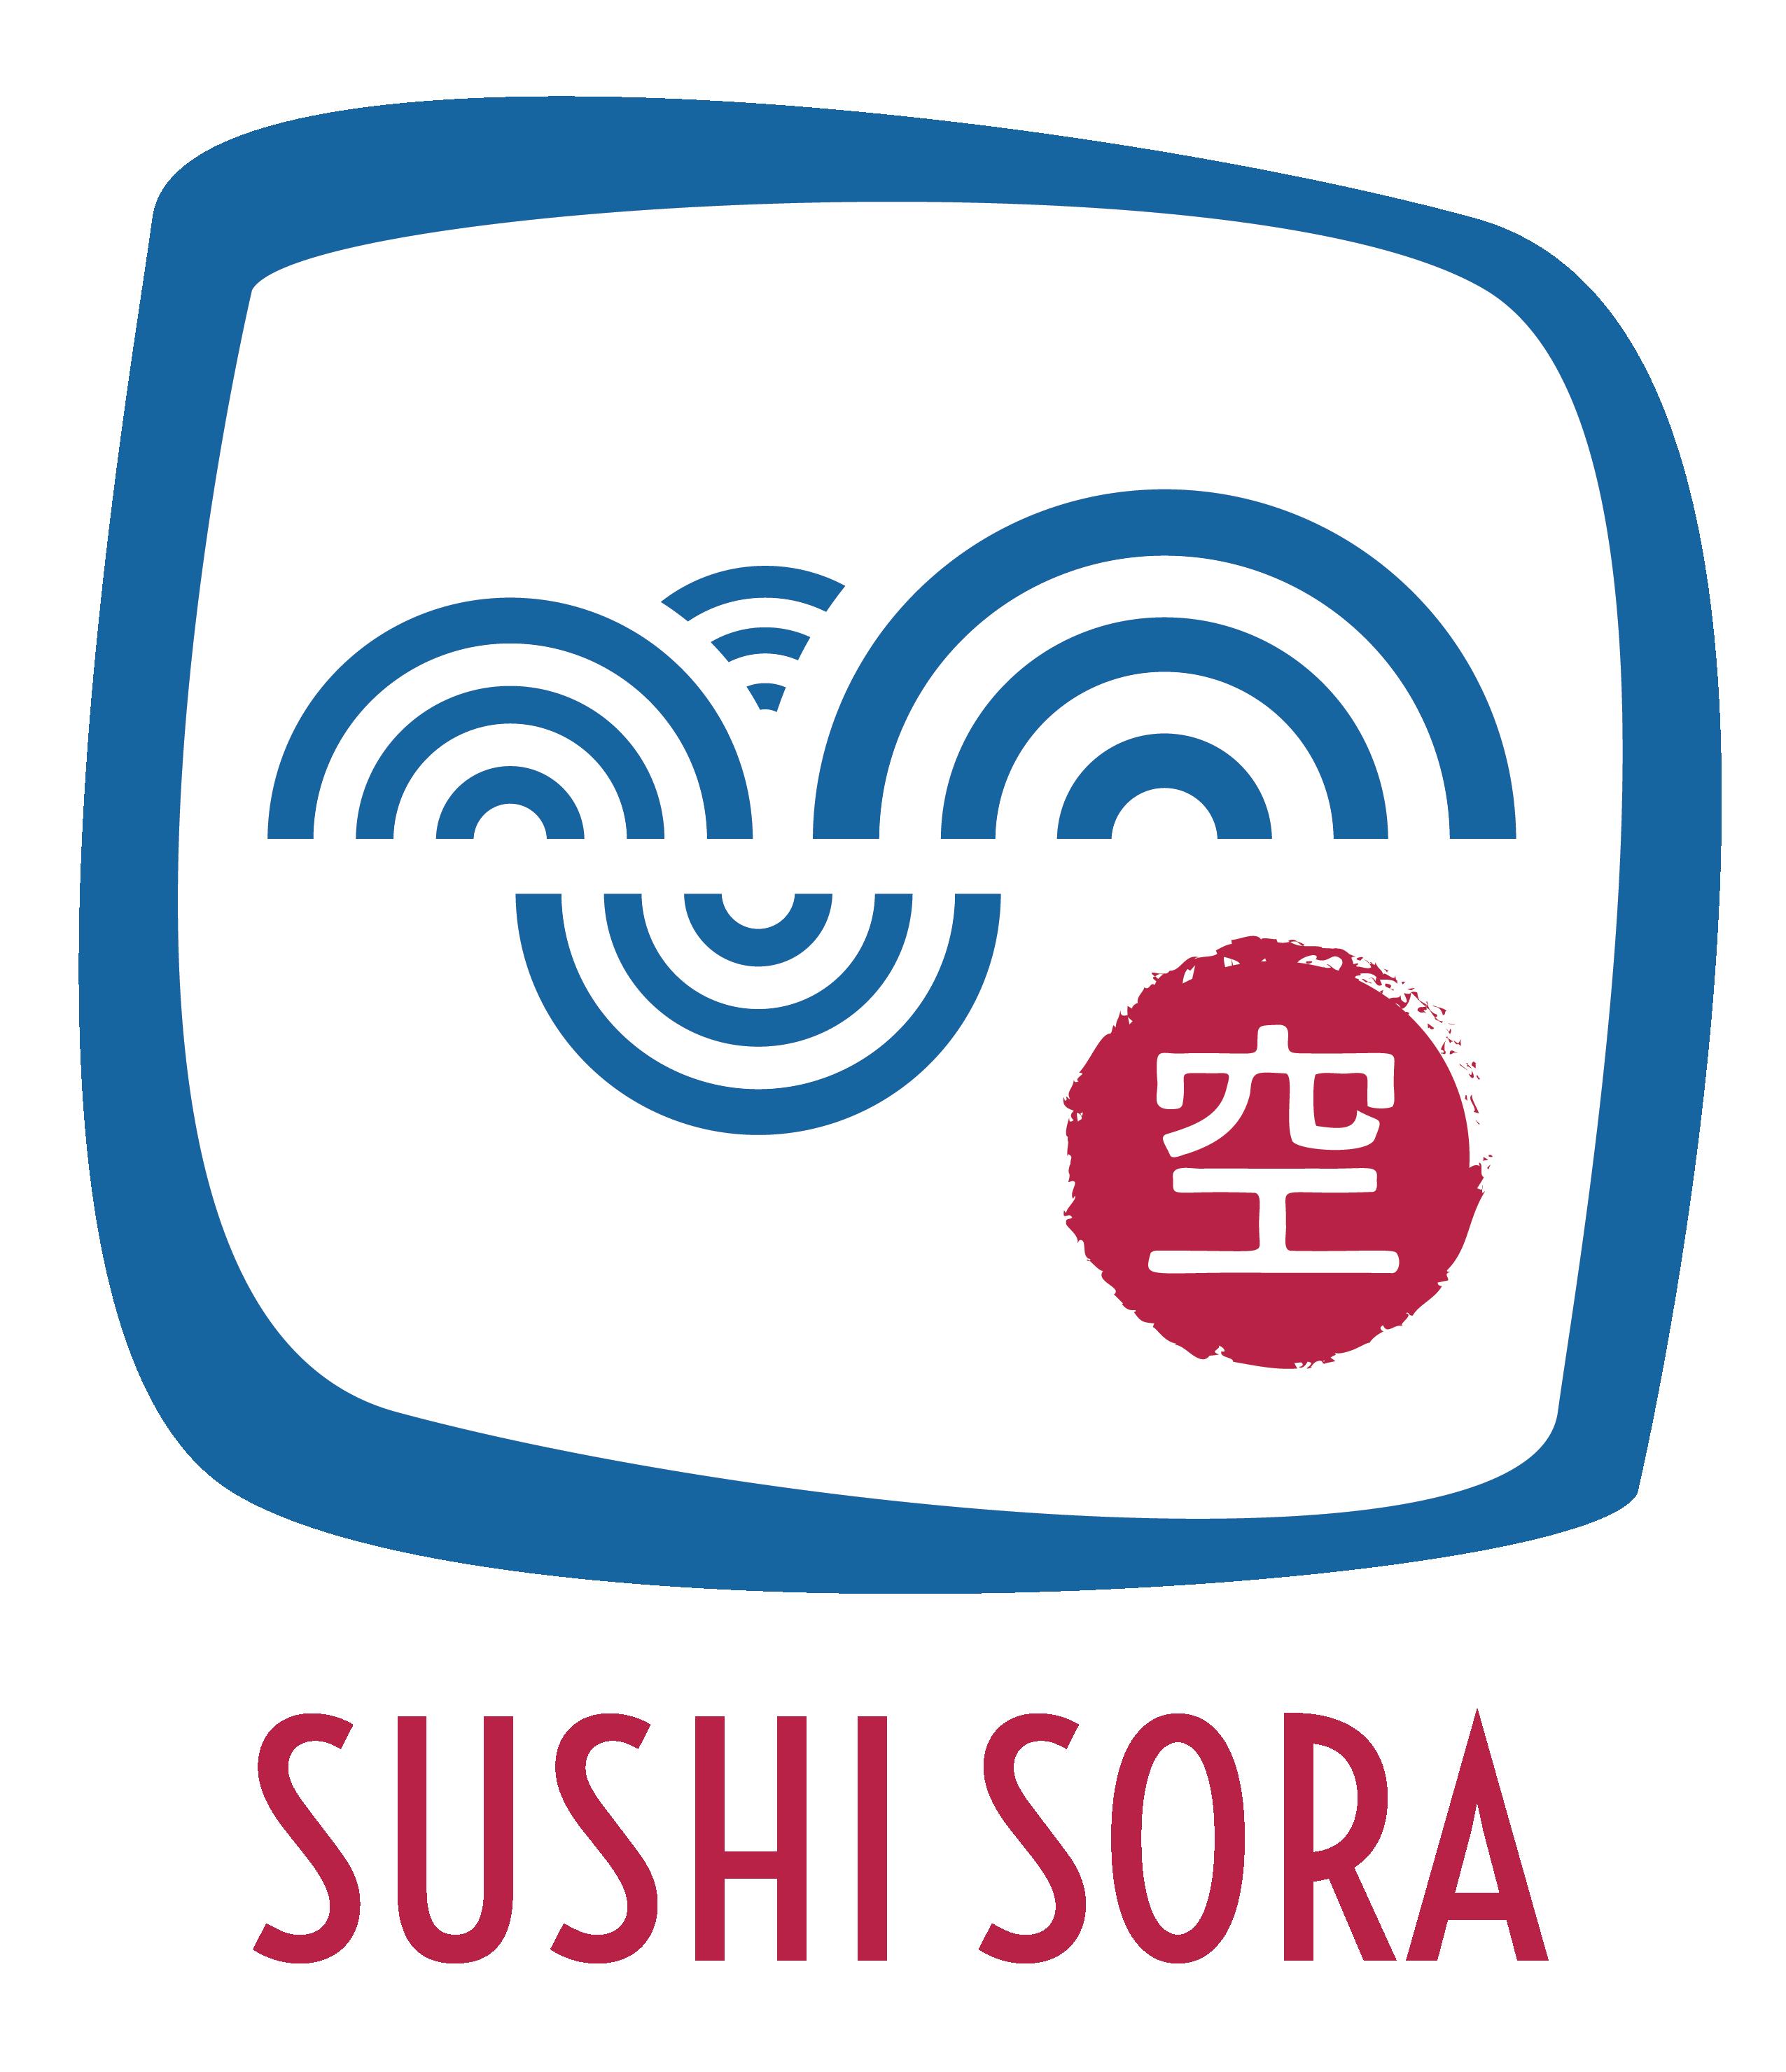 Sushi Sora